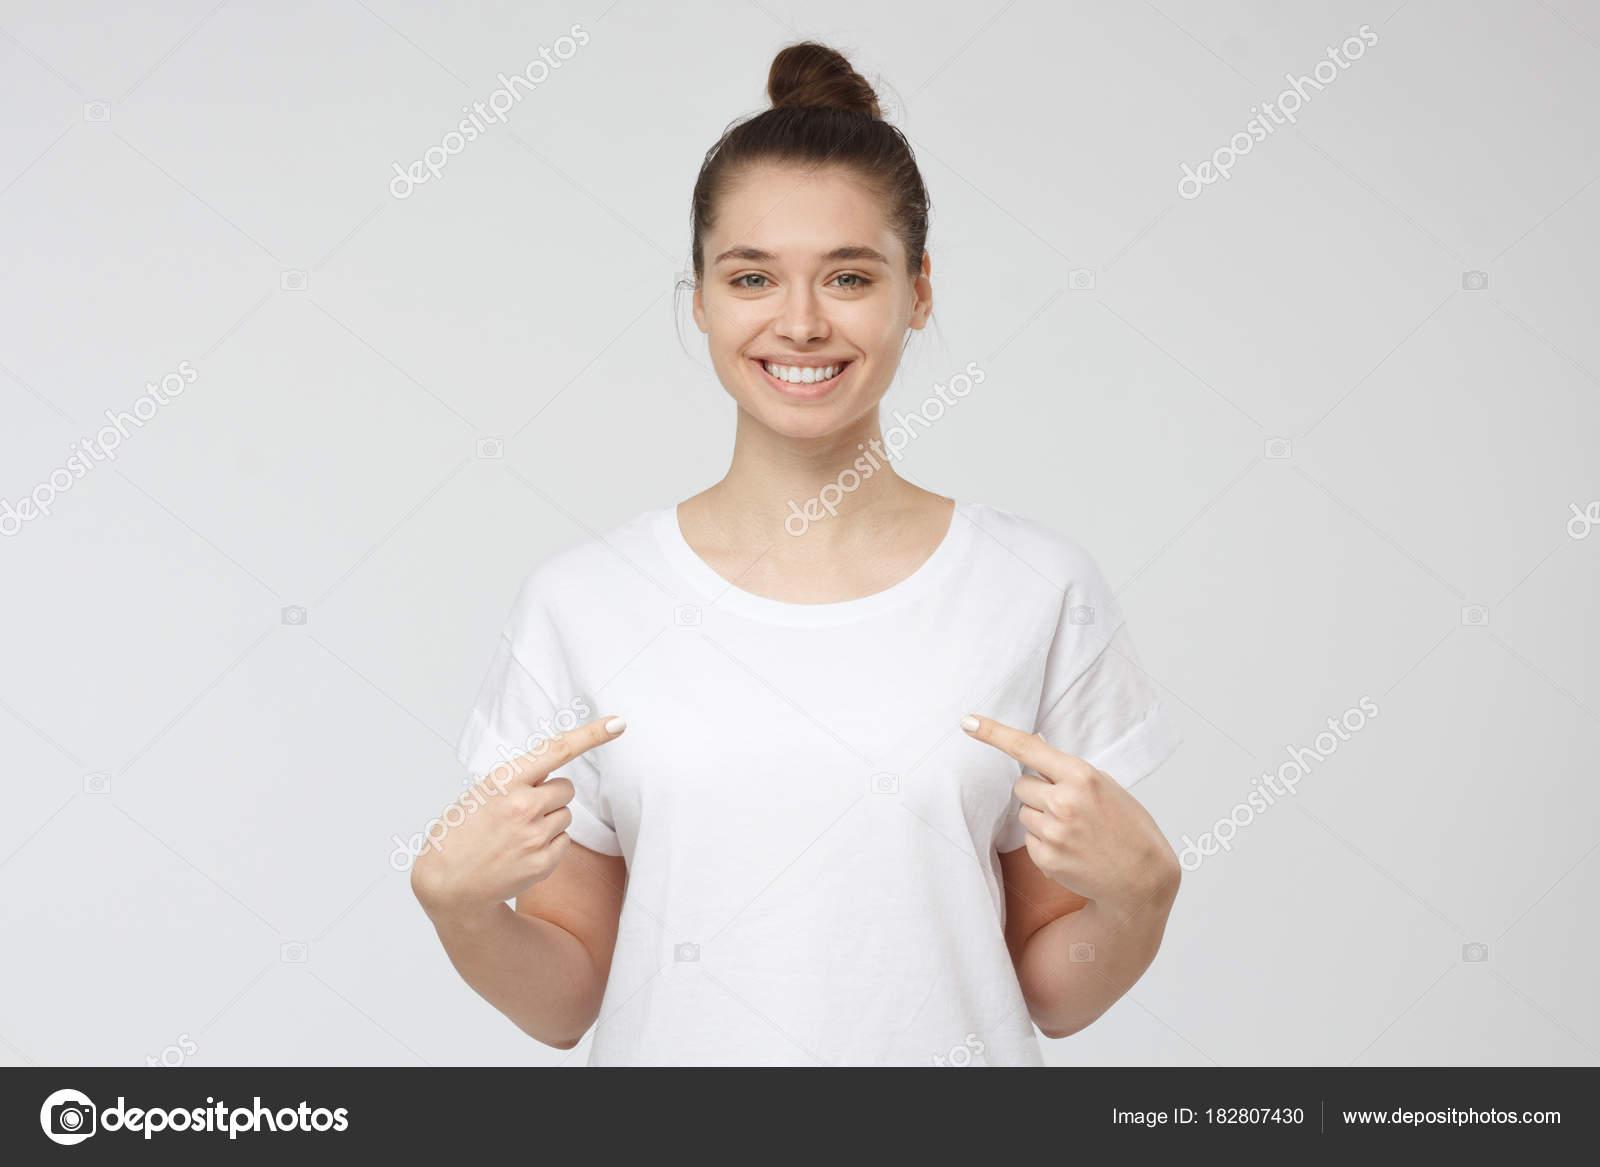 depositphotos_182807430-stock-photo-smiling-nice-woman-pointing-at.jpg